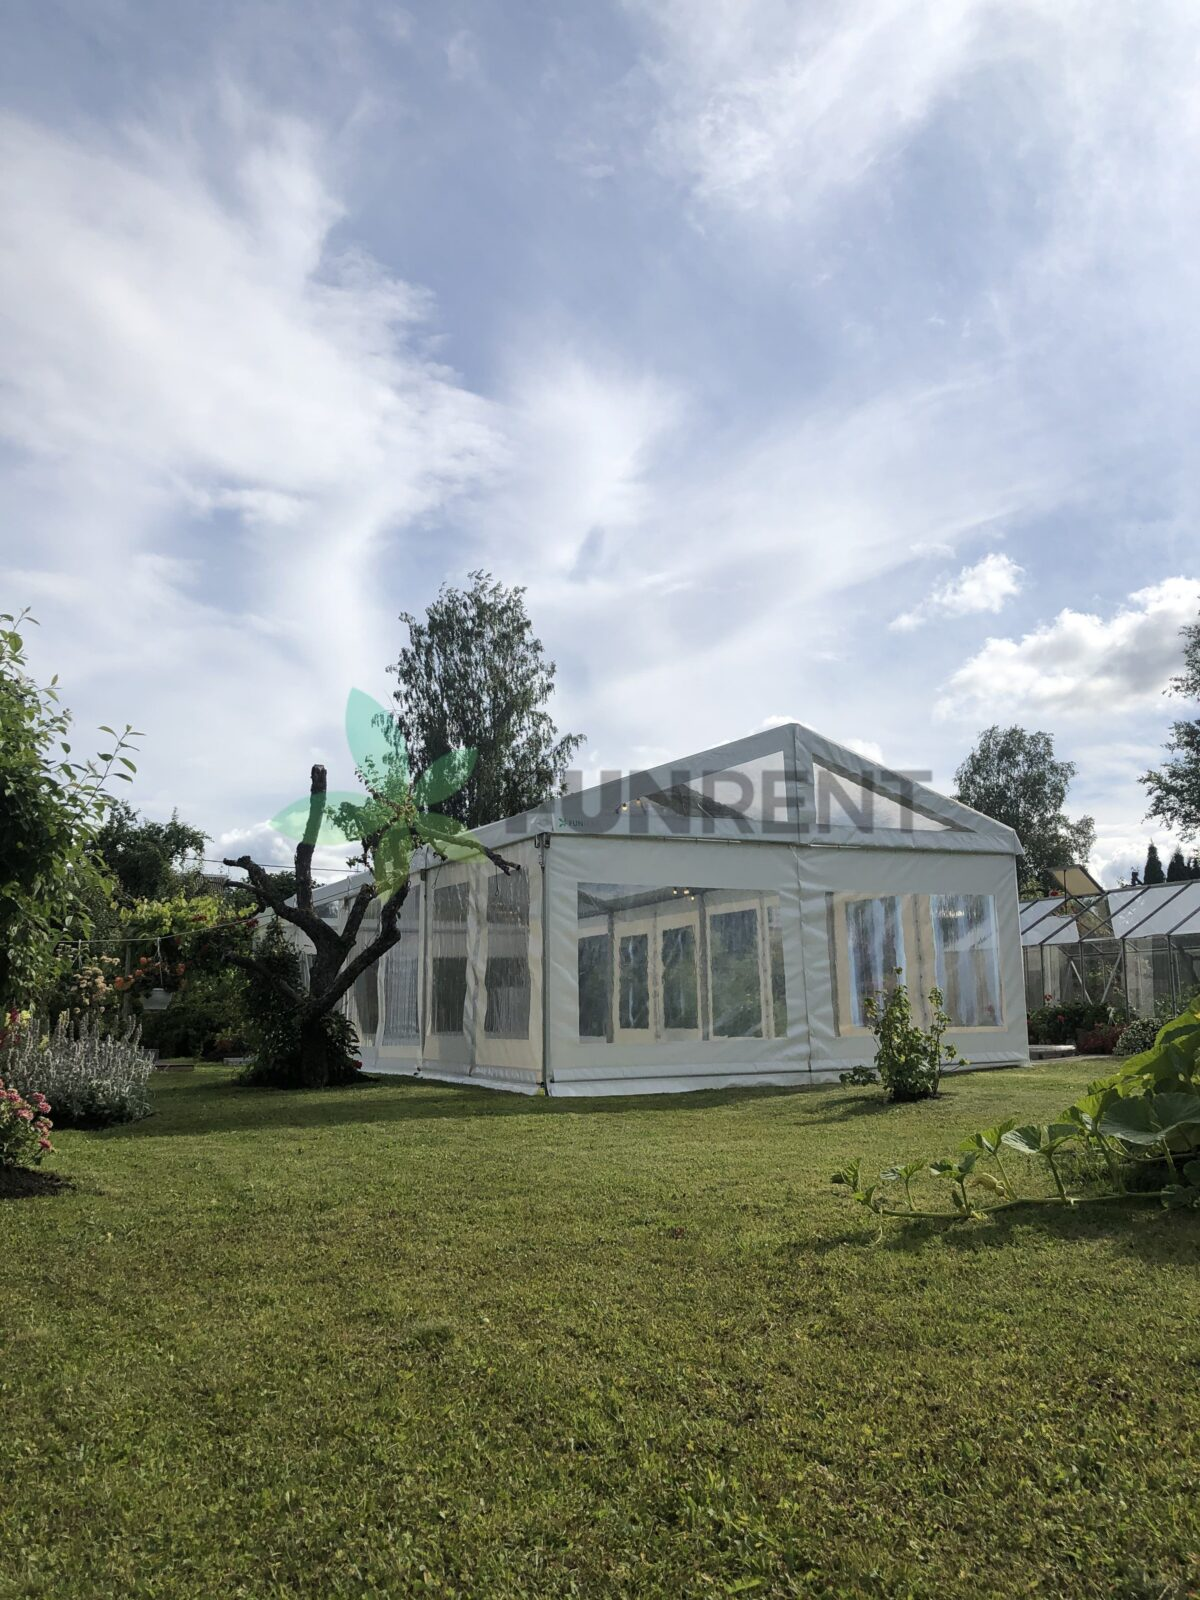 aiatelk, peotelk, telgi rent, telkide rent